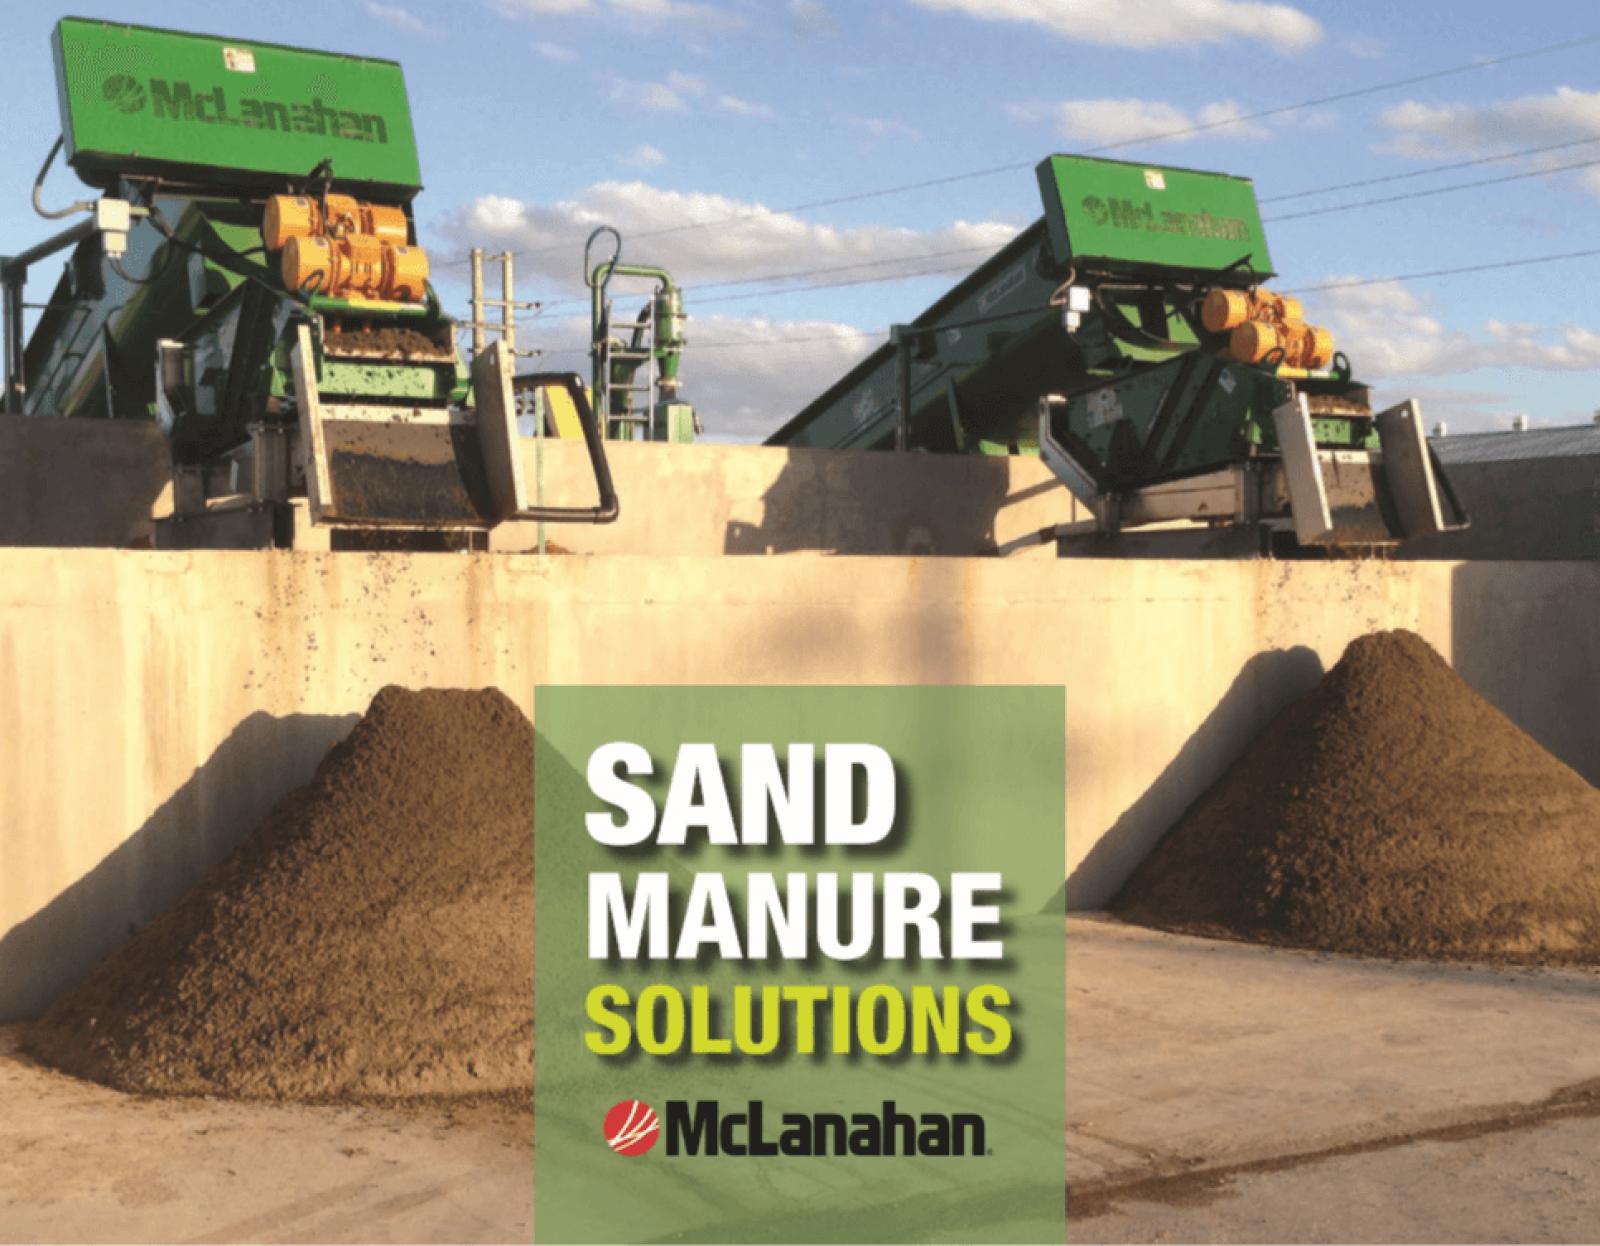 Sand Manure Solutions Brochure Image